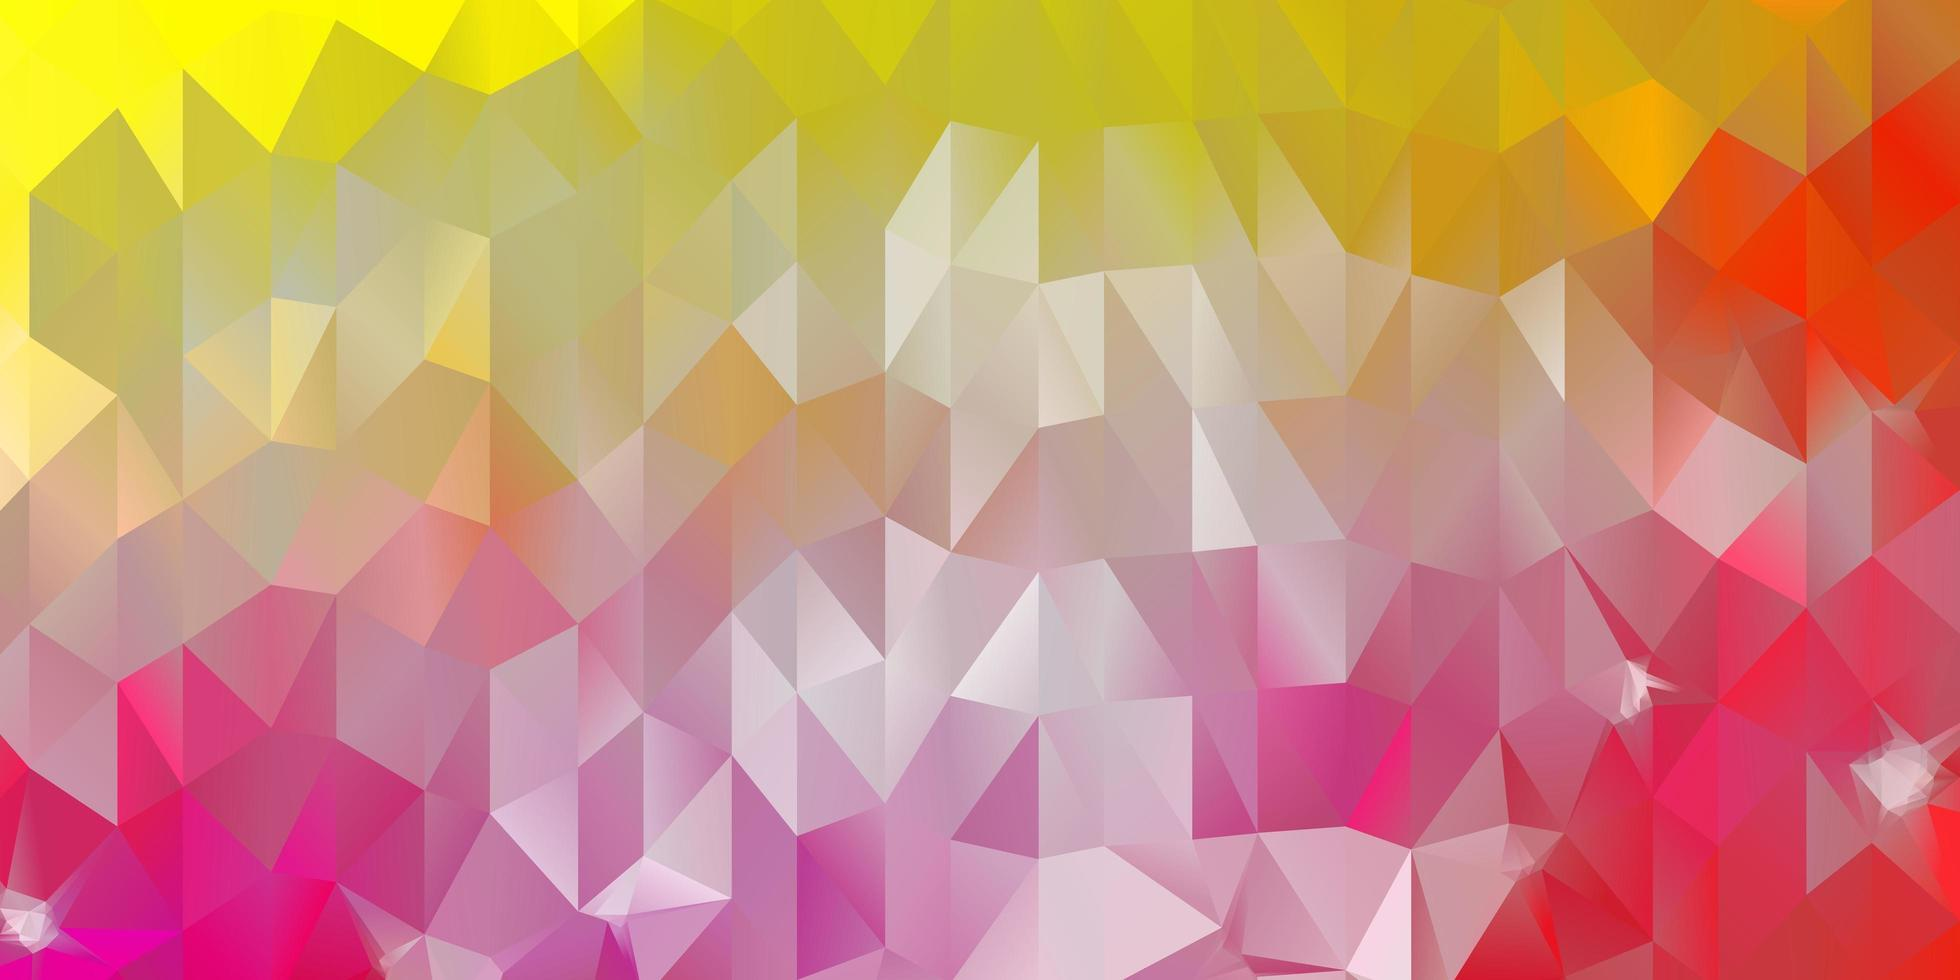 geometrisches polygonales Layout des hellrosa, gelben Vektors. vektor